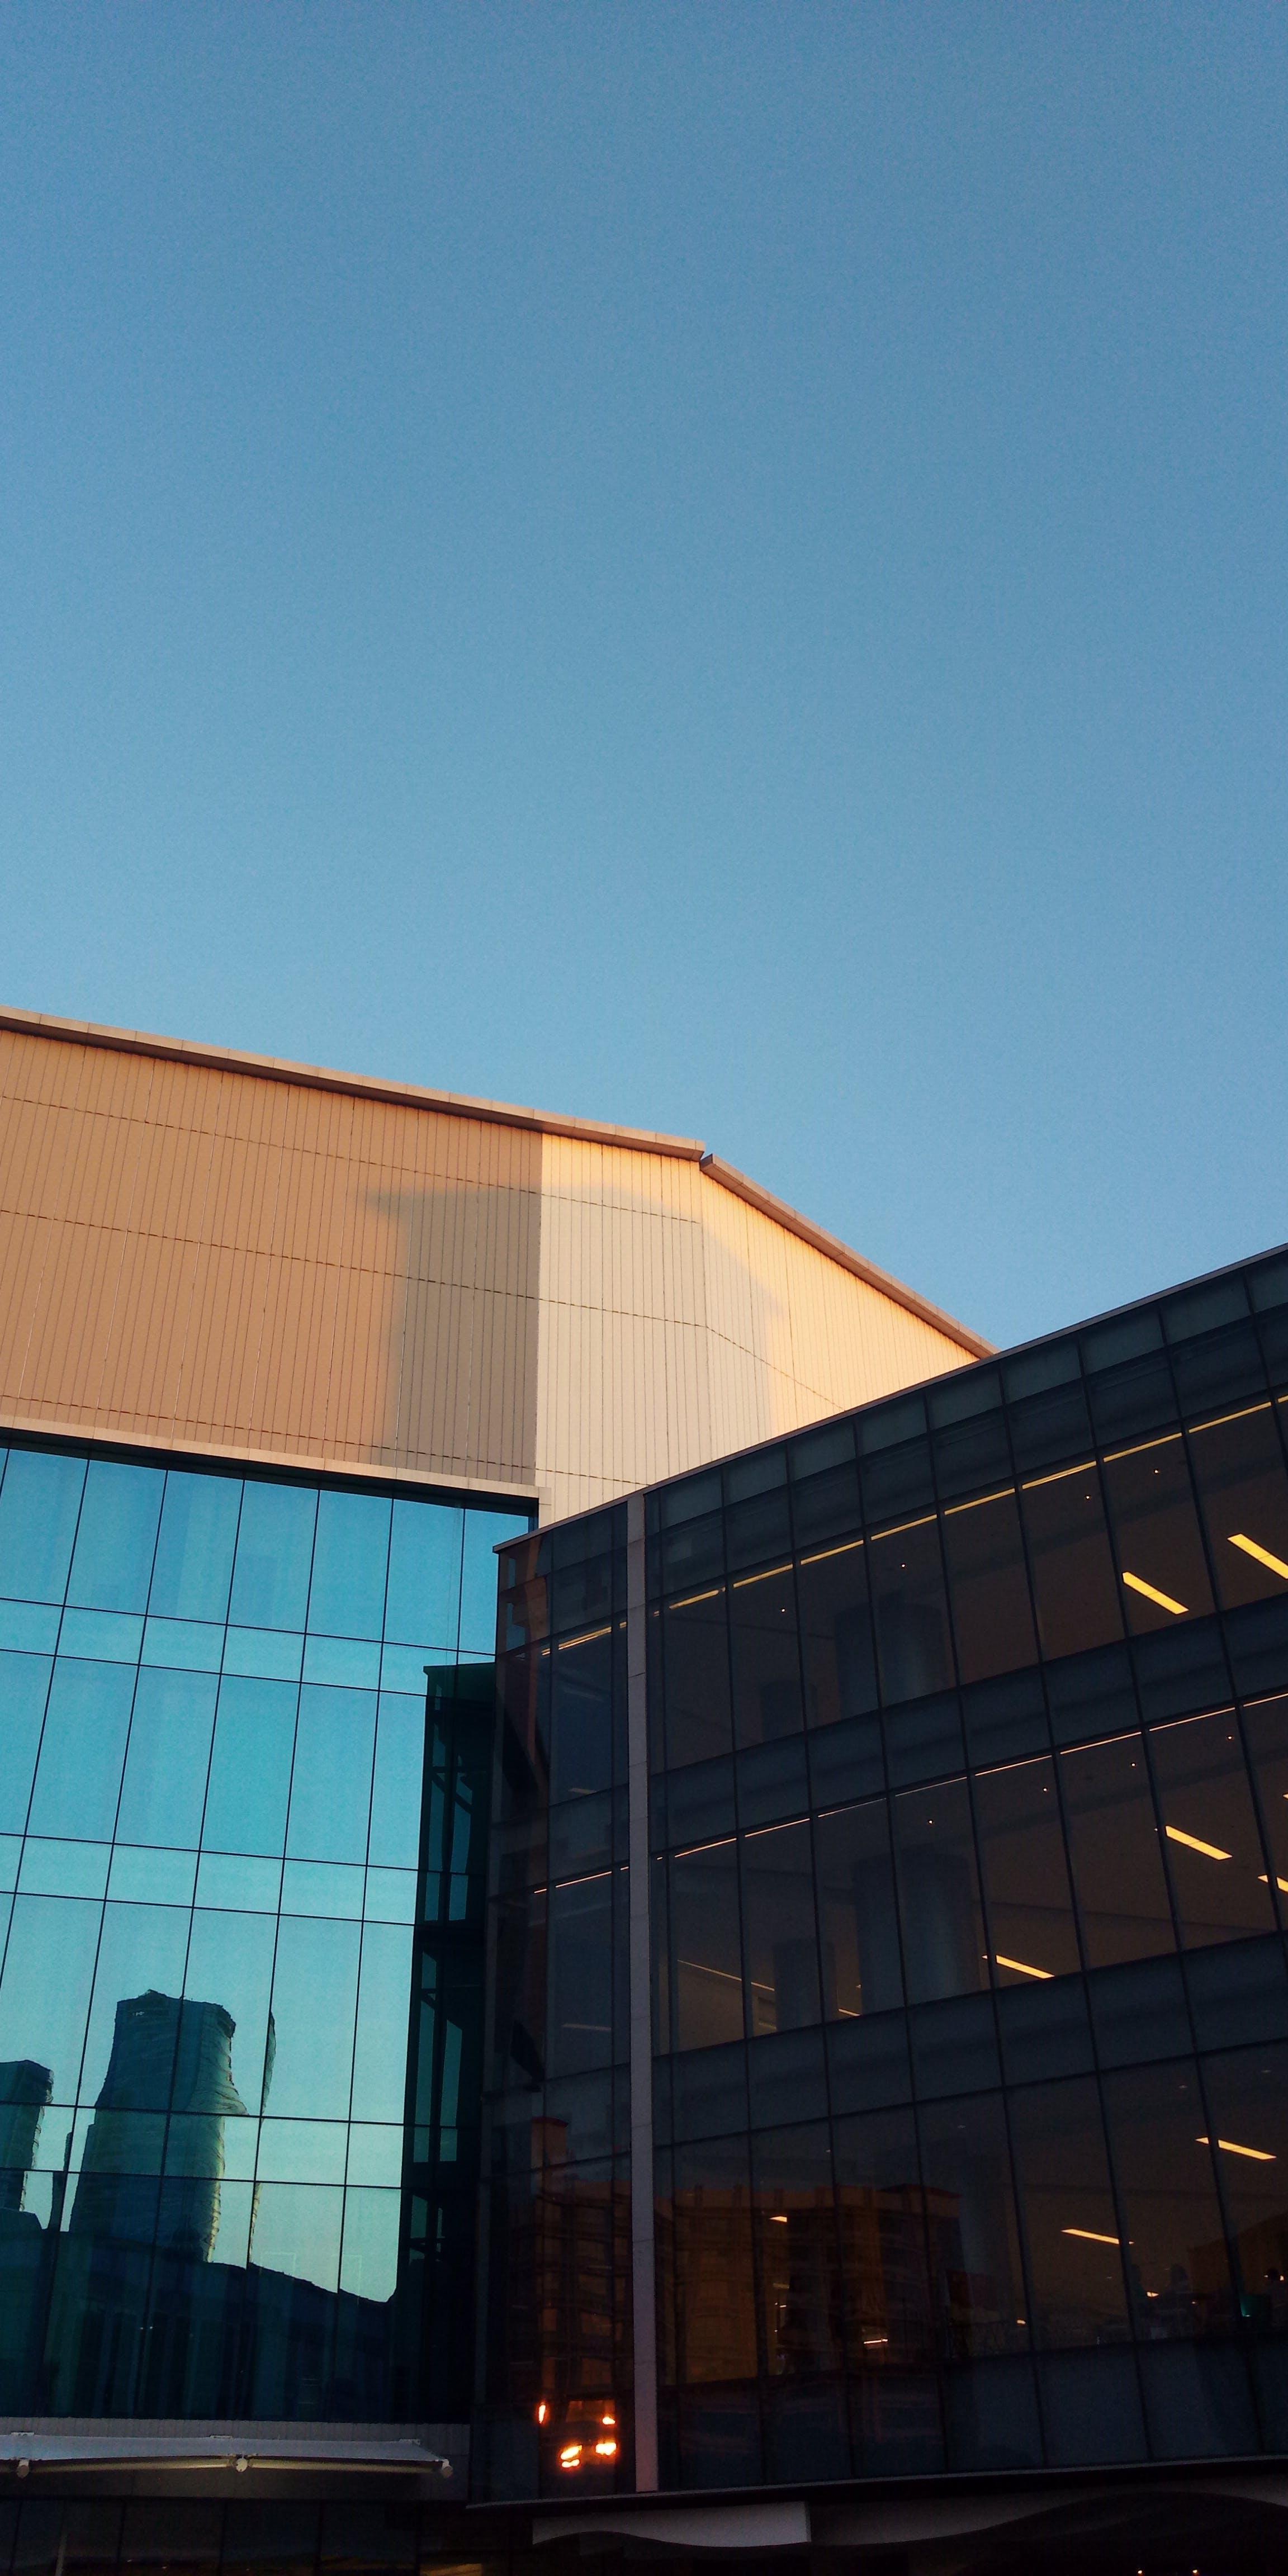 Free stock photo of blue, glass, orange, mall